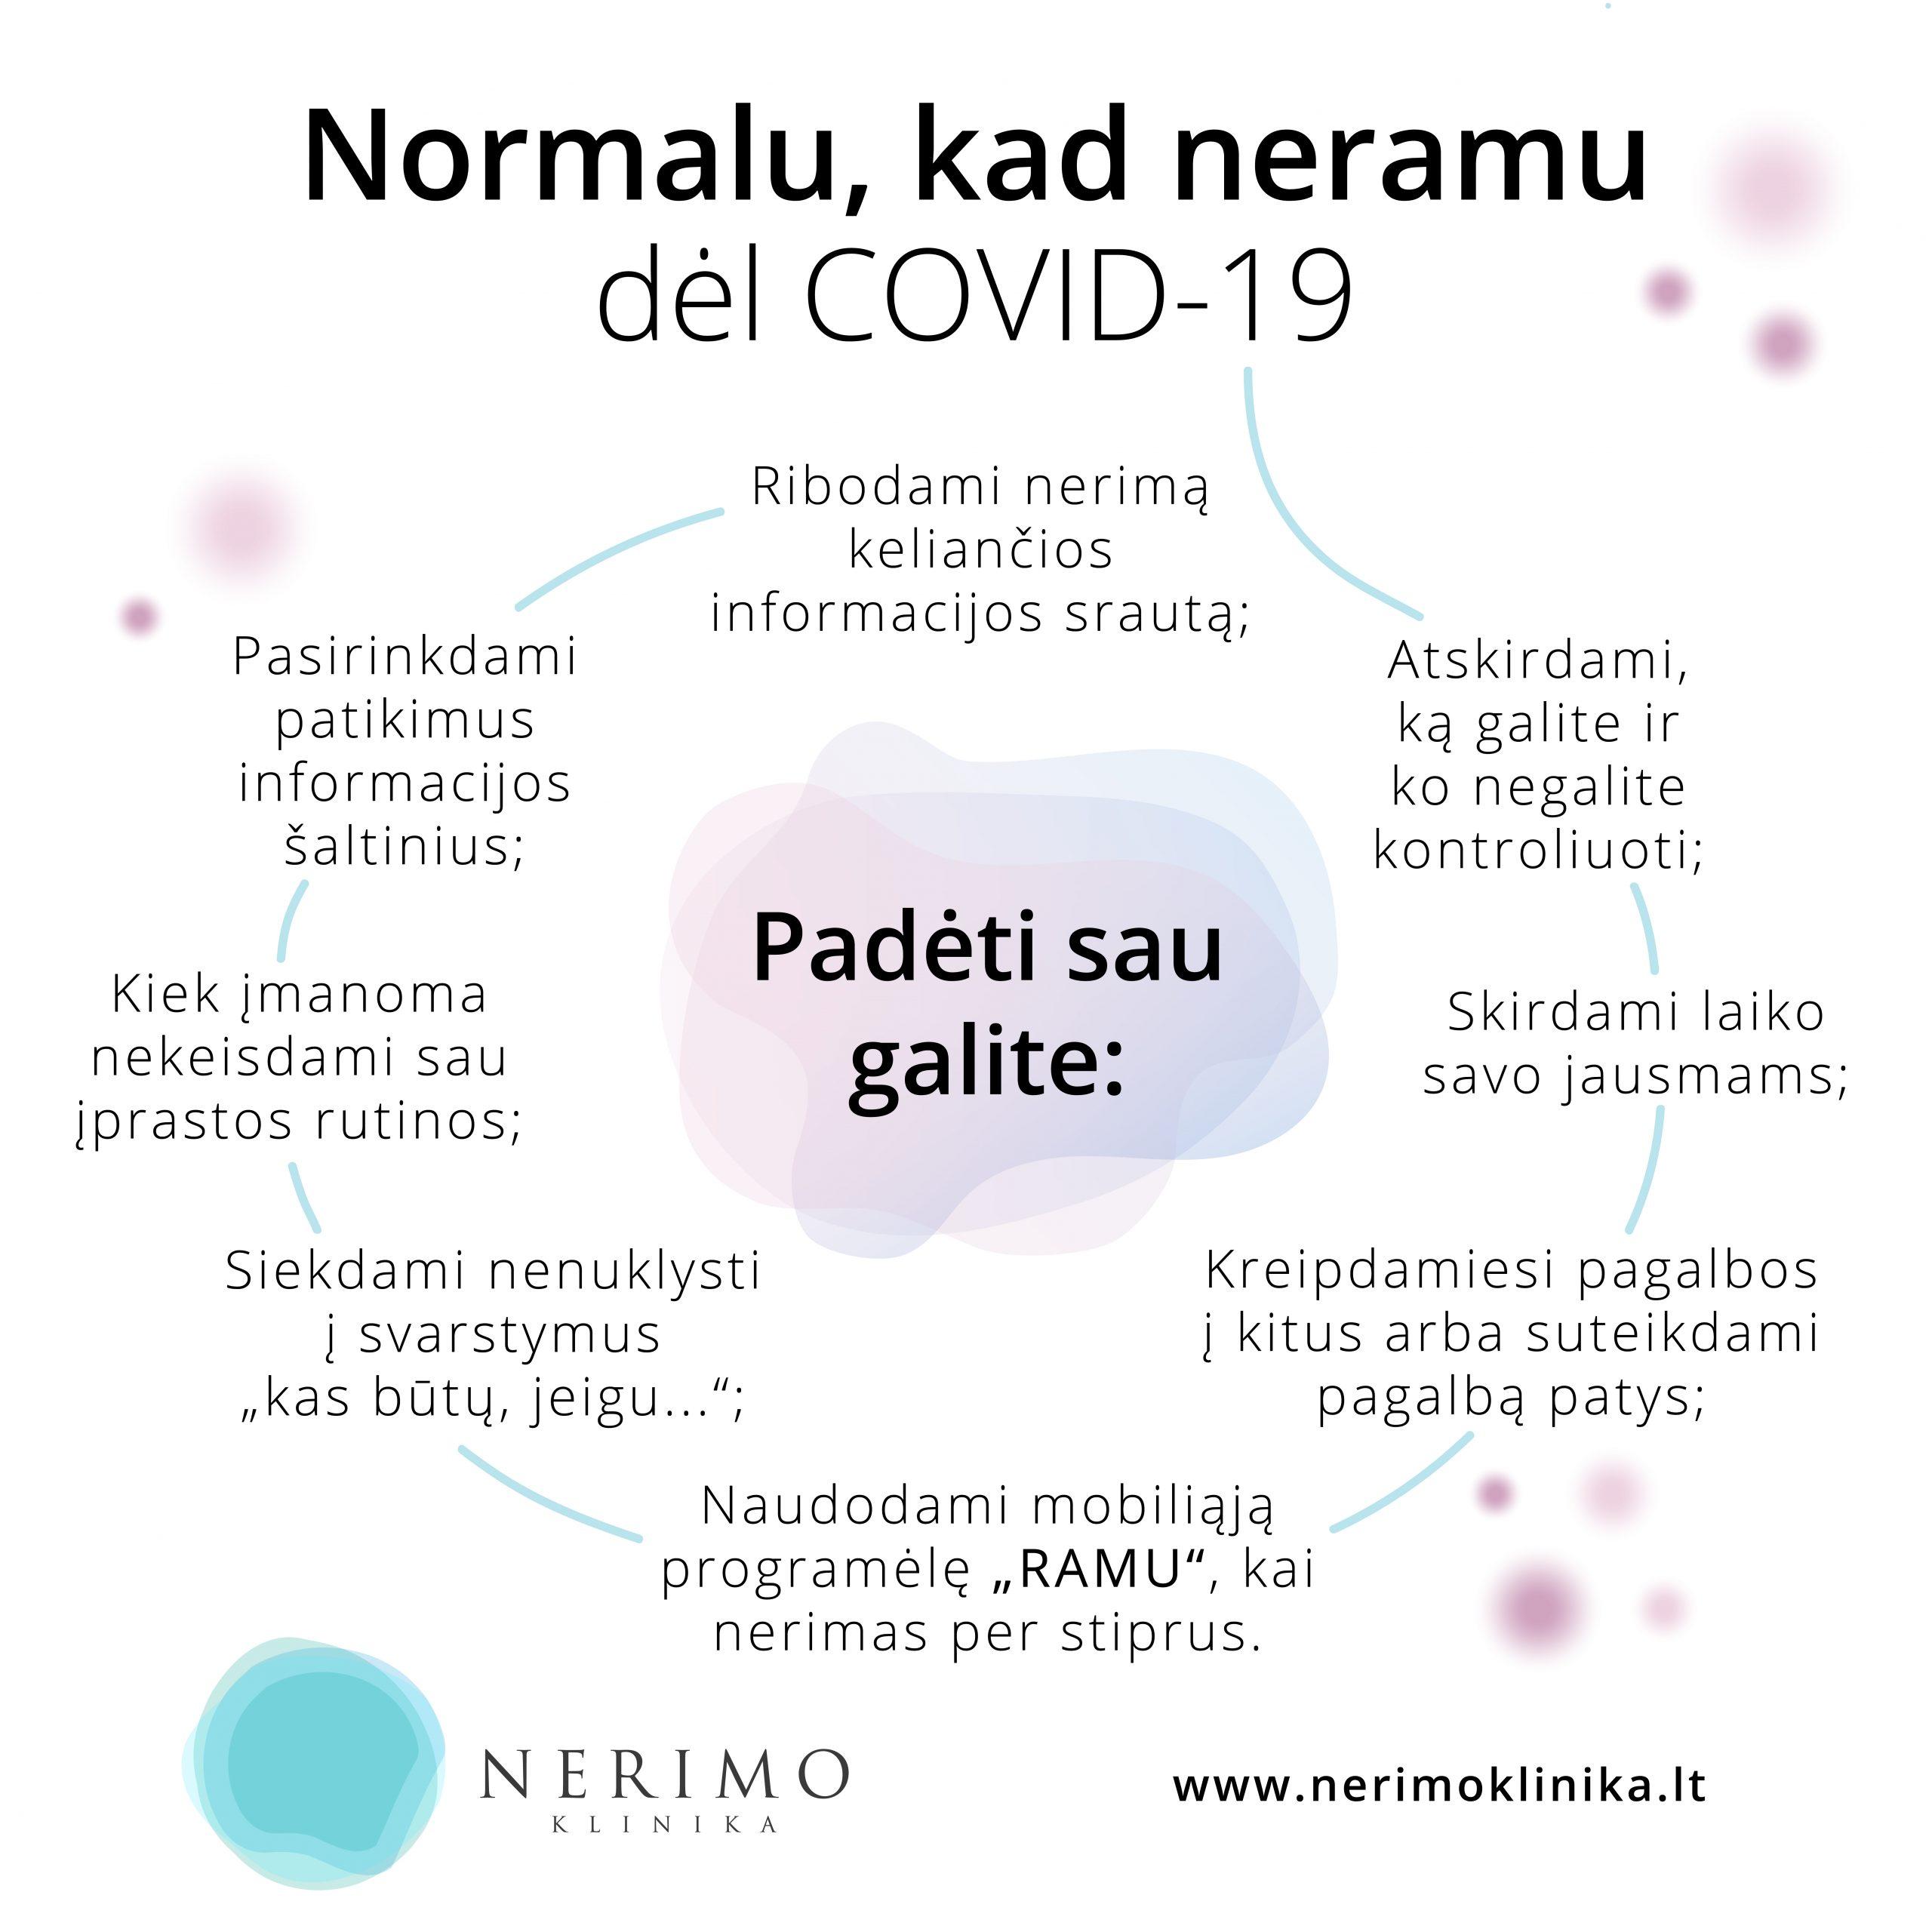 Normalu, kad neramu dėl COVID-19